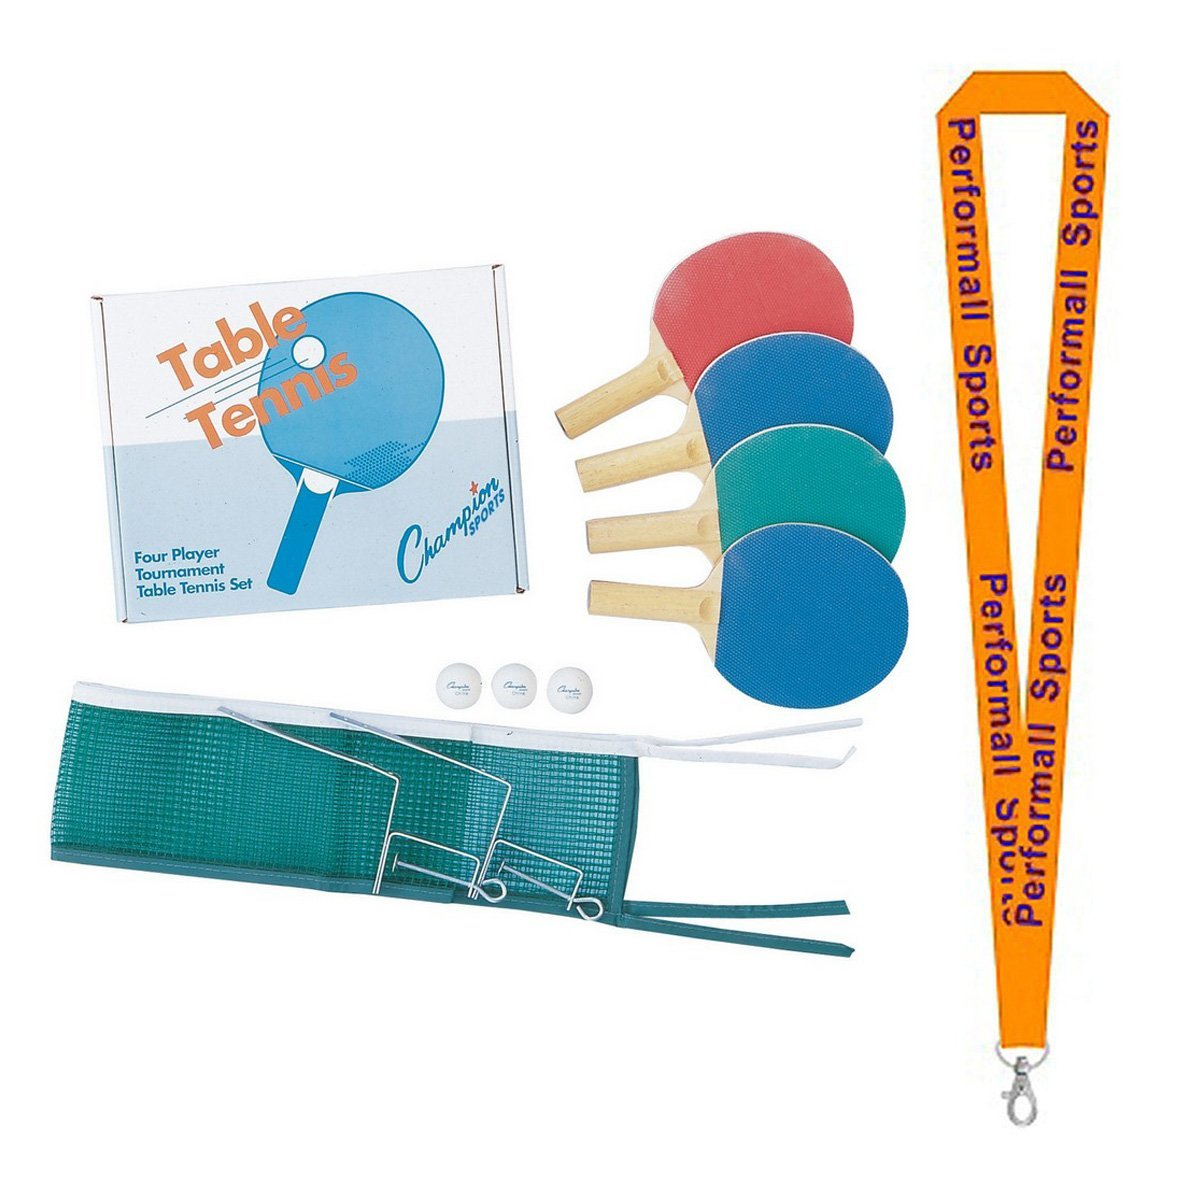 Definitely the Easiest Net /& Post Set to Assemble 603-97 Killerspin Table Tennis Clip-On Net /& Post Set